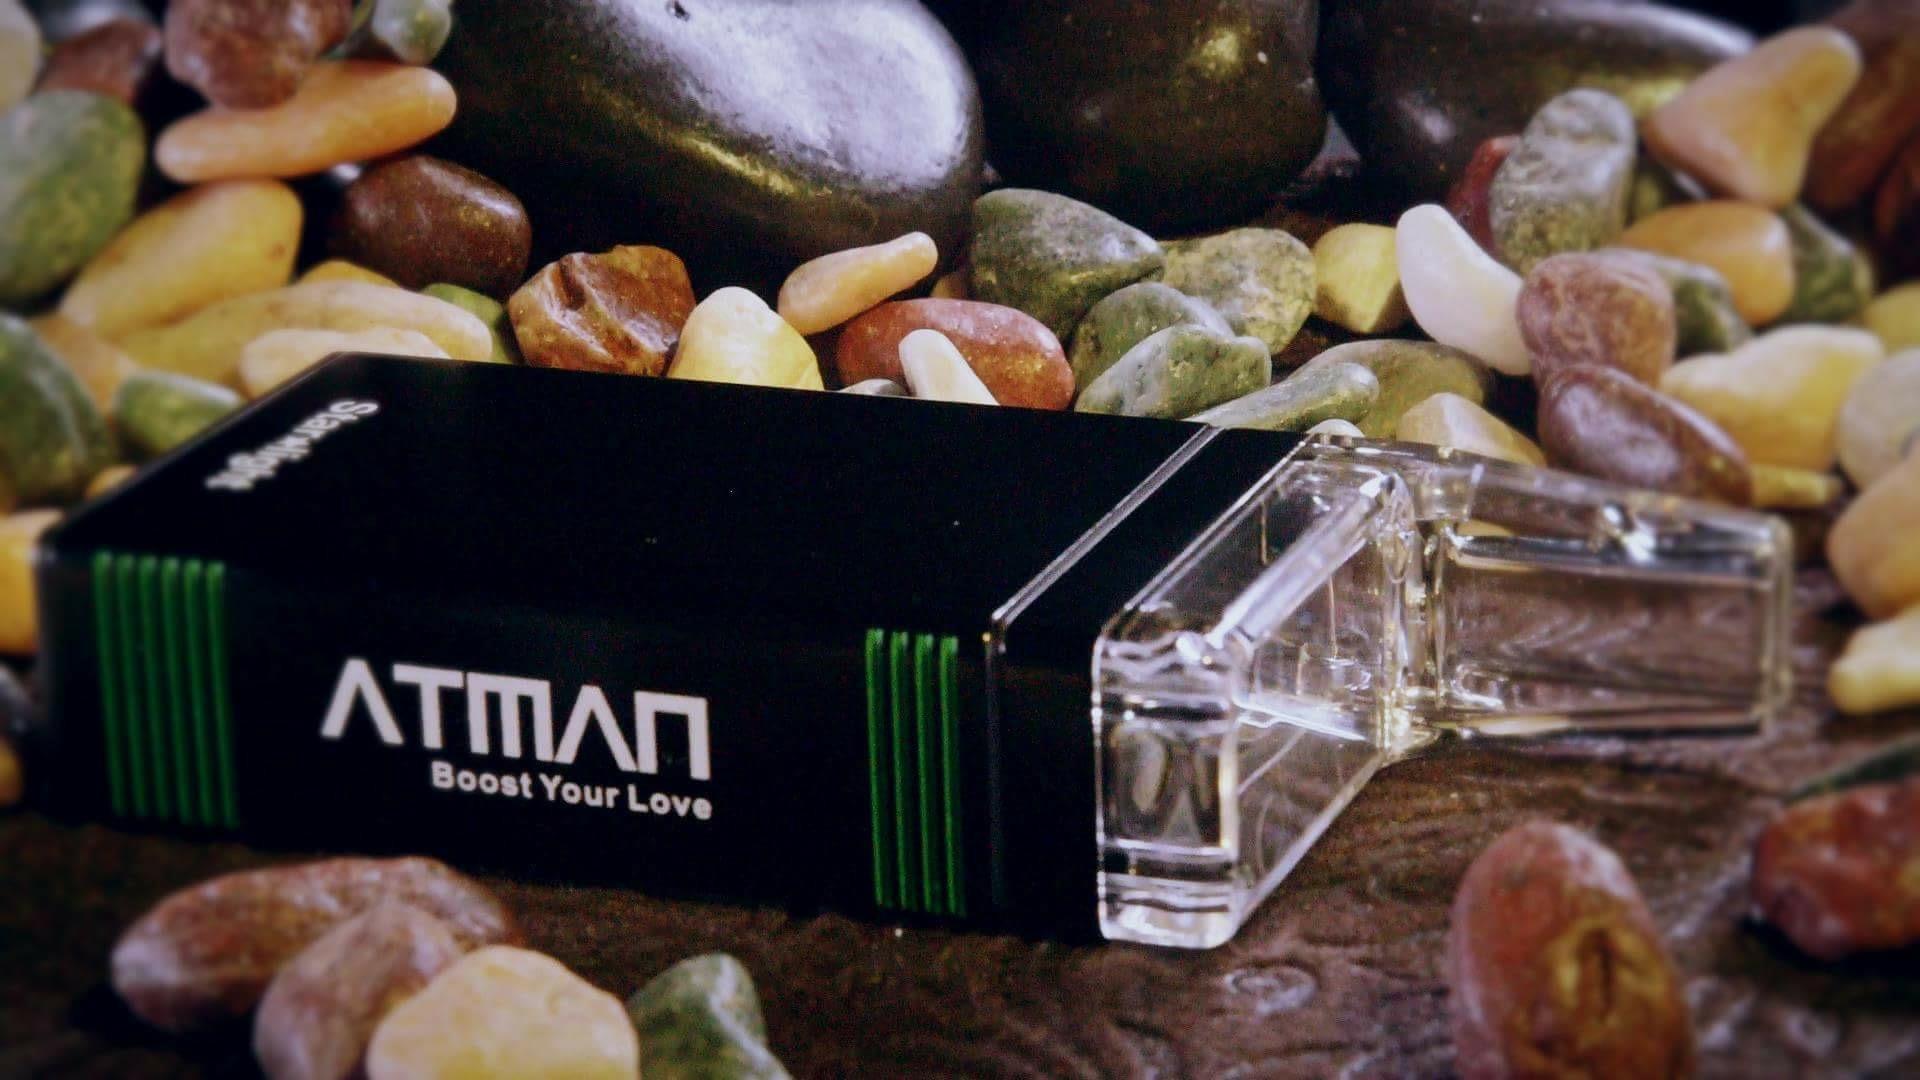 Starlight Atman vaporizer